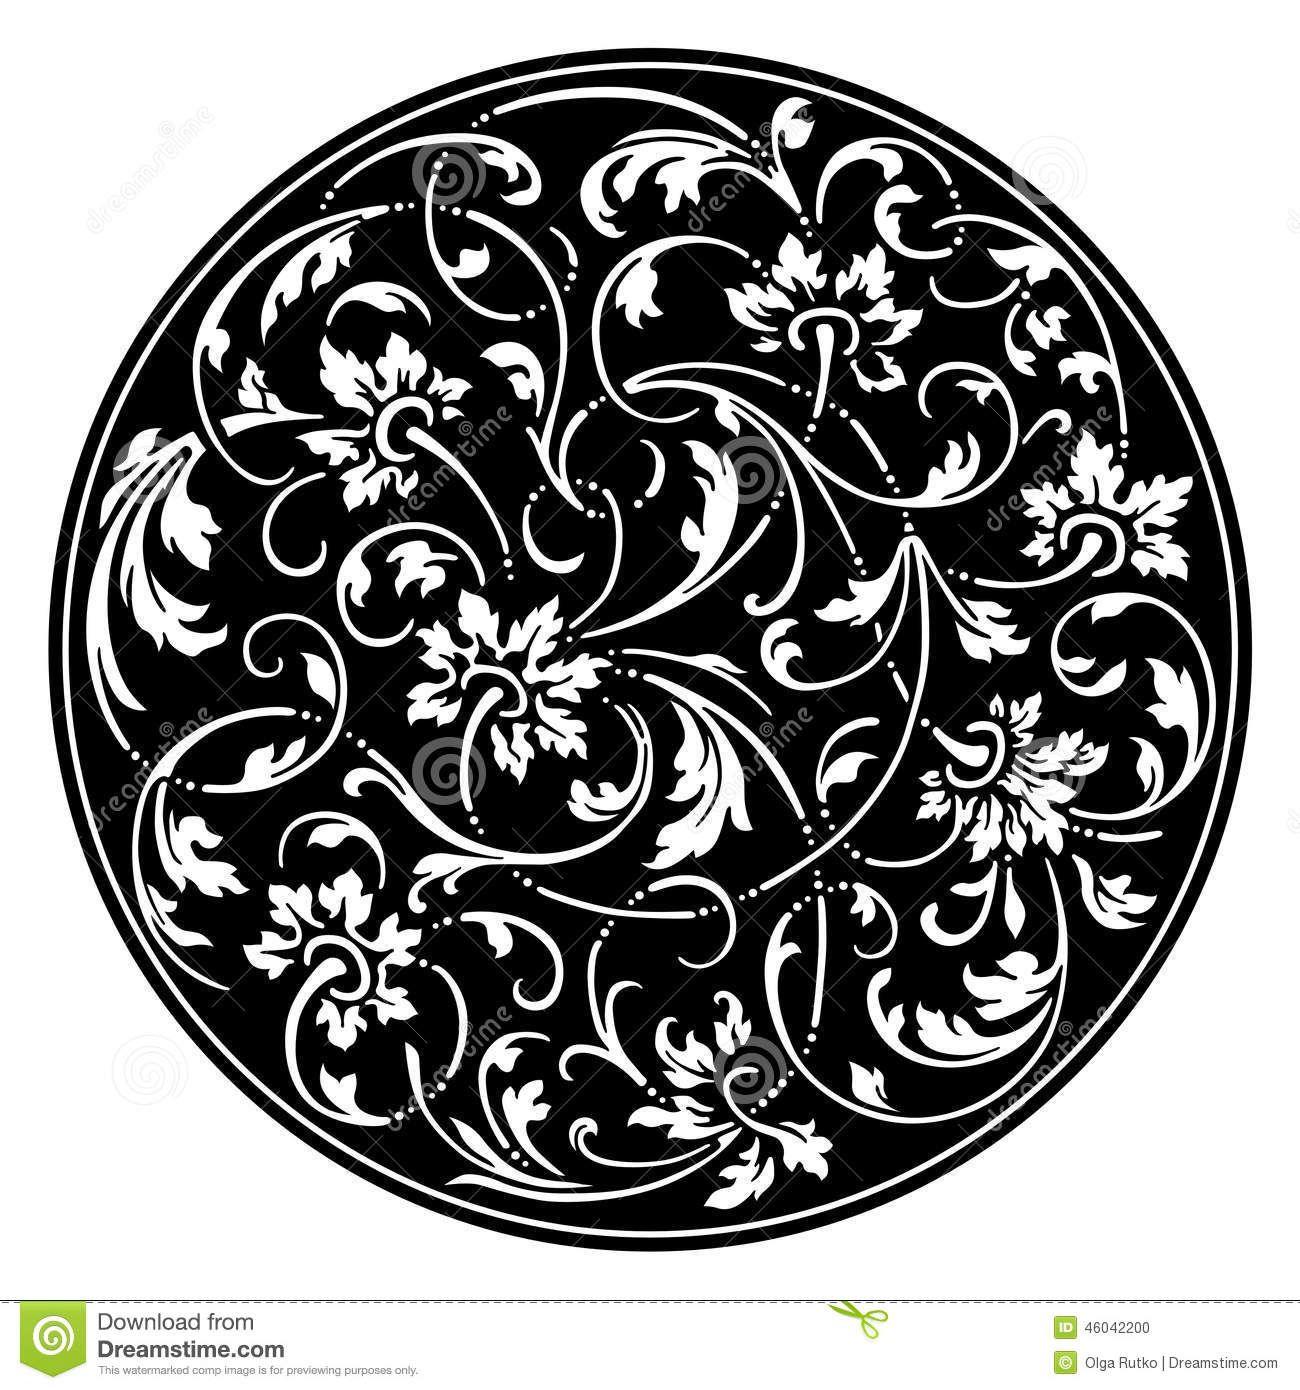 Illustration about Vector illustration of Black round